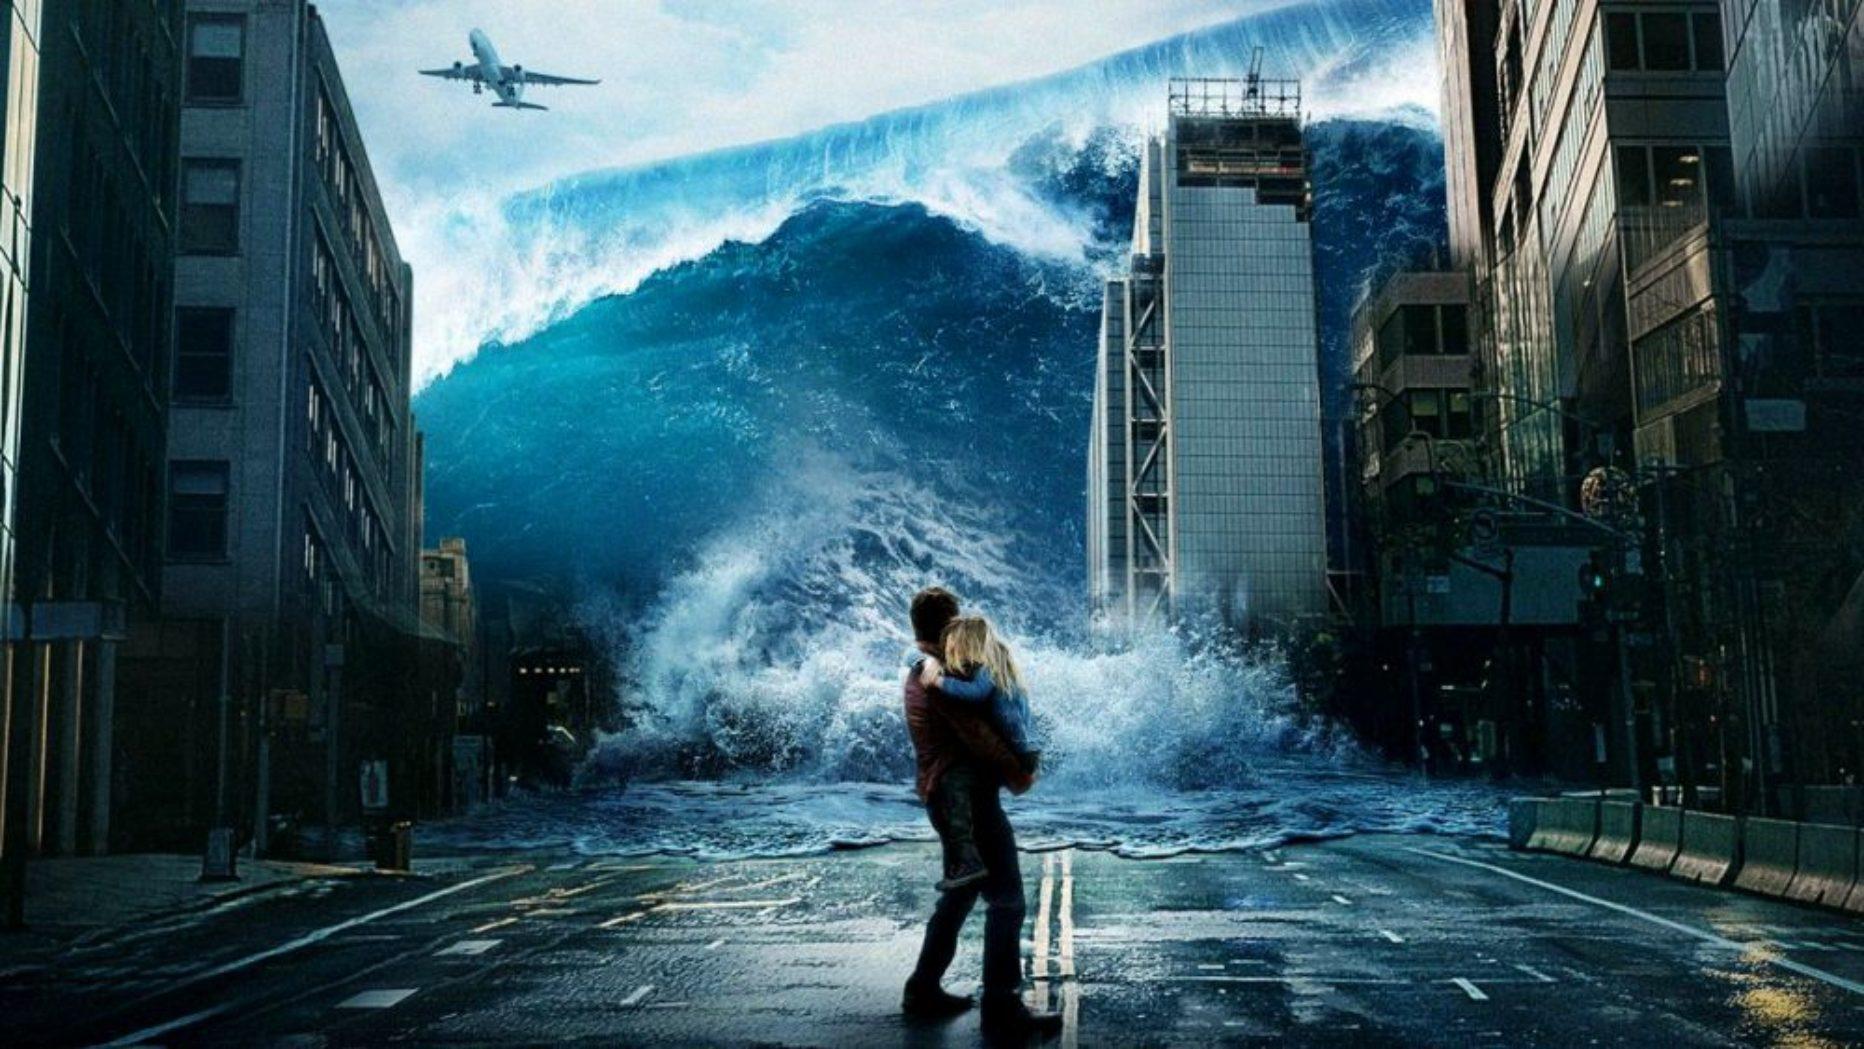 lhTtnsPmEYUJB7nOaTKJzYoxJ7X-1864x10491 Geostorm